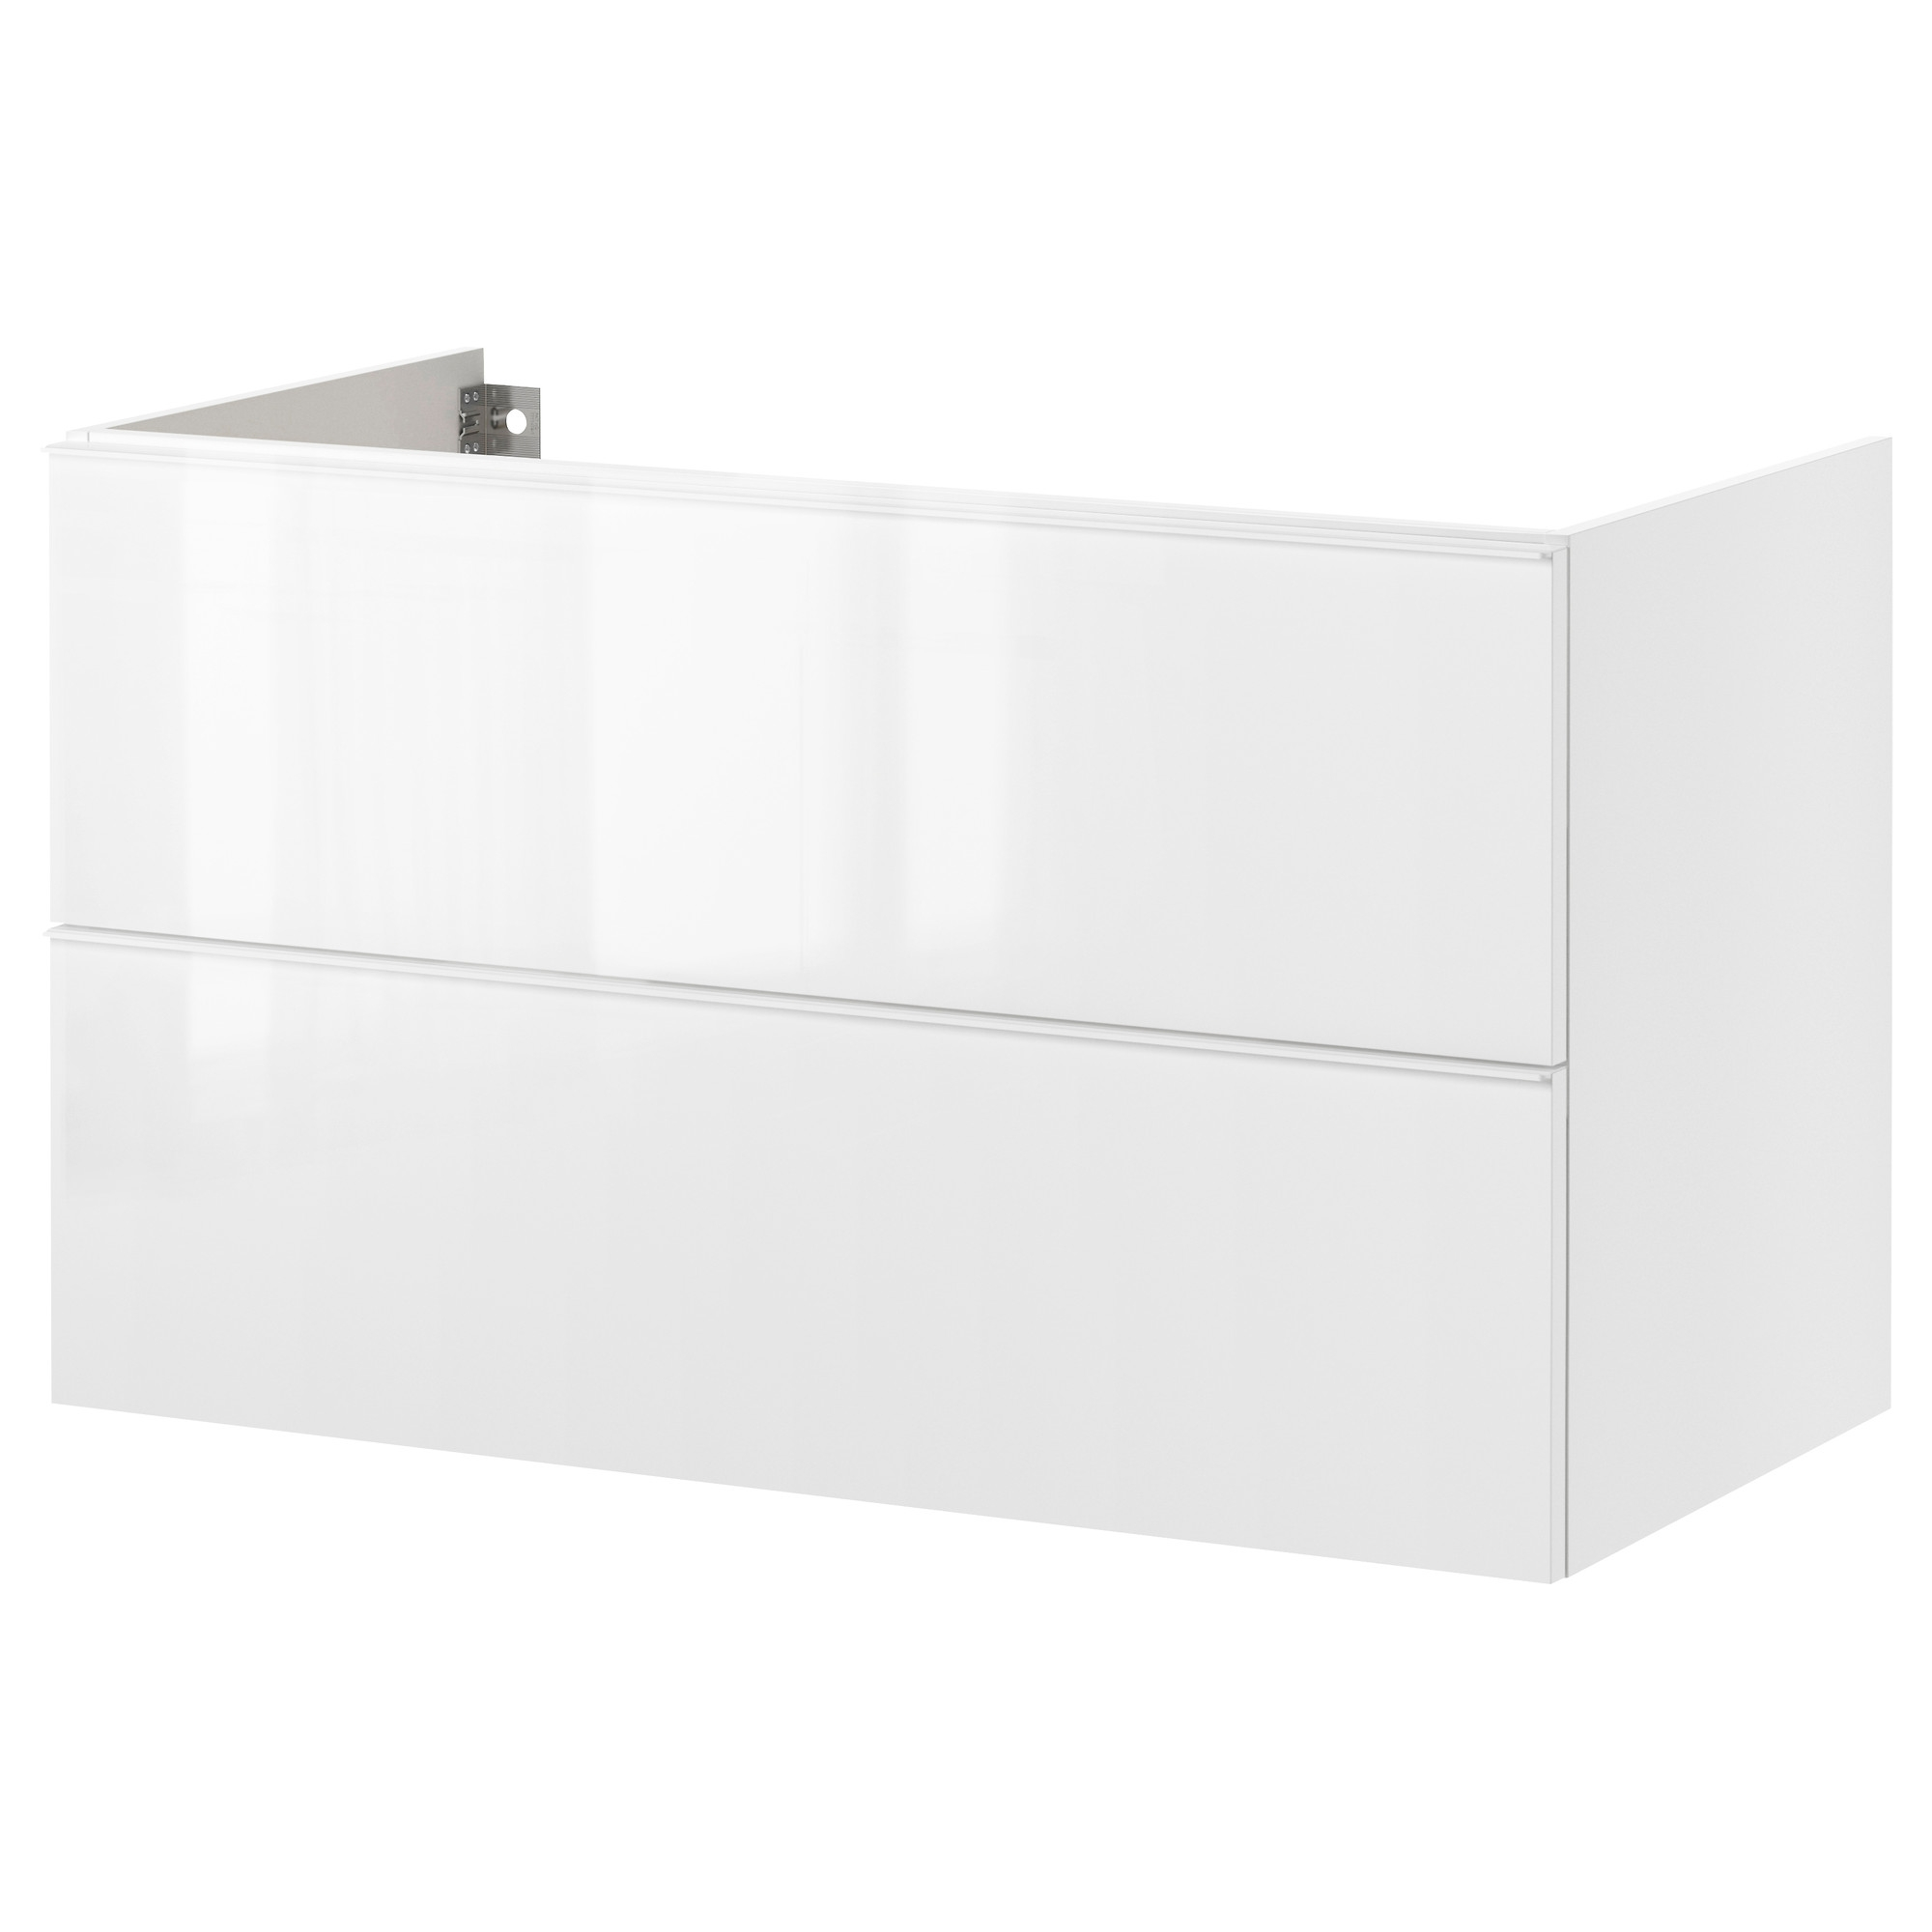 godmorgon armario lavabo 2 cajones 80 blanco. Black Bedroom Furniture Sets. Home Design Ideas